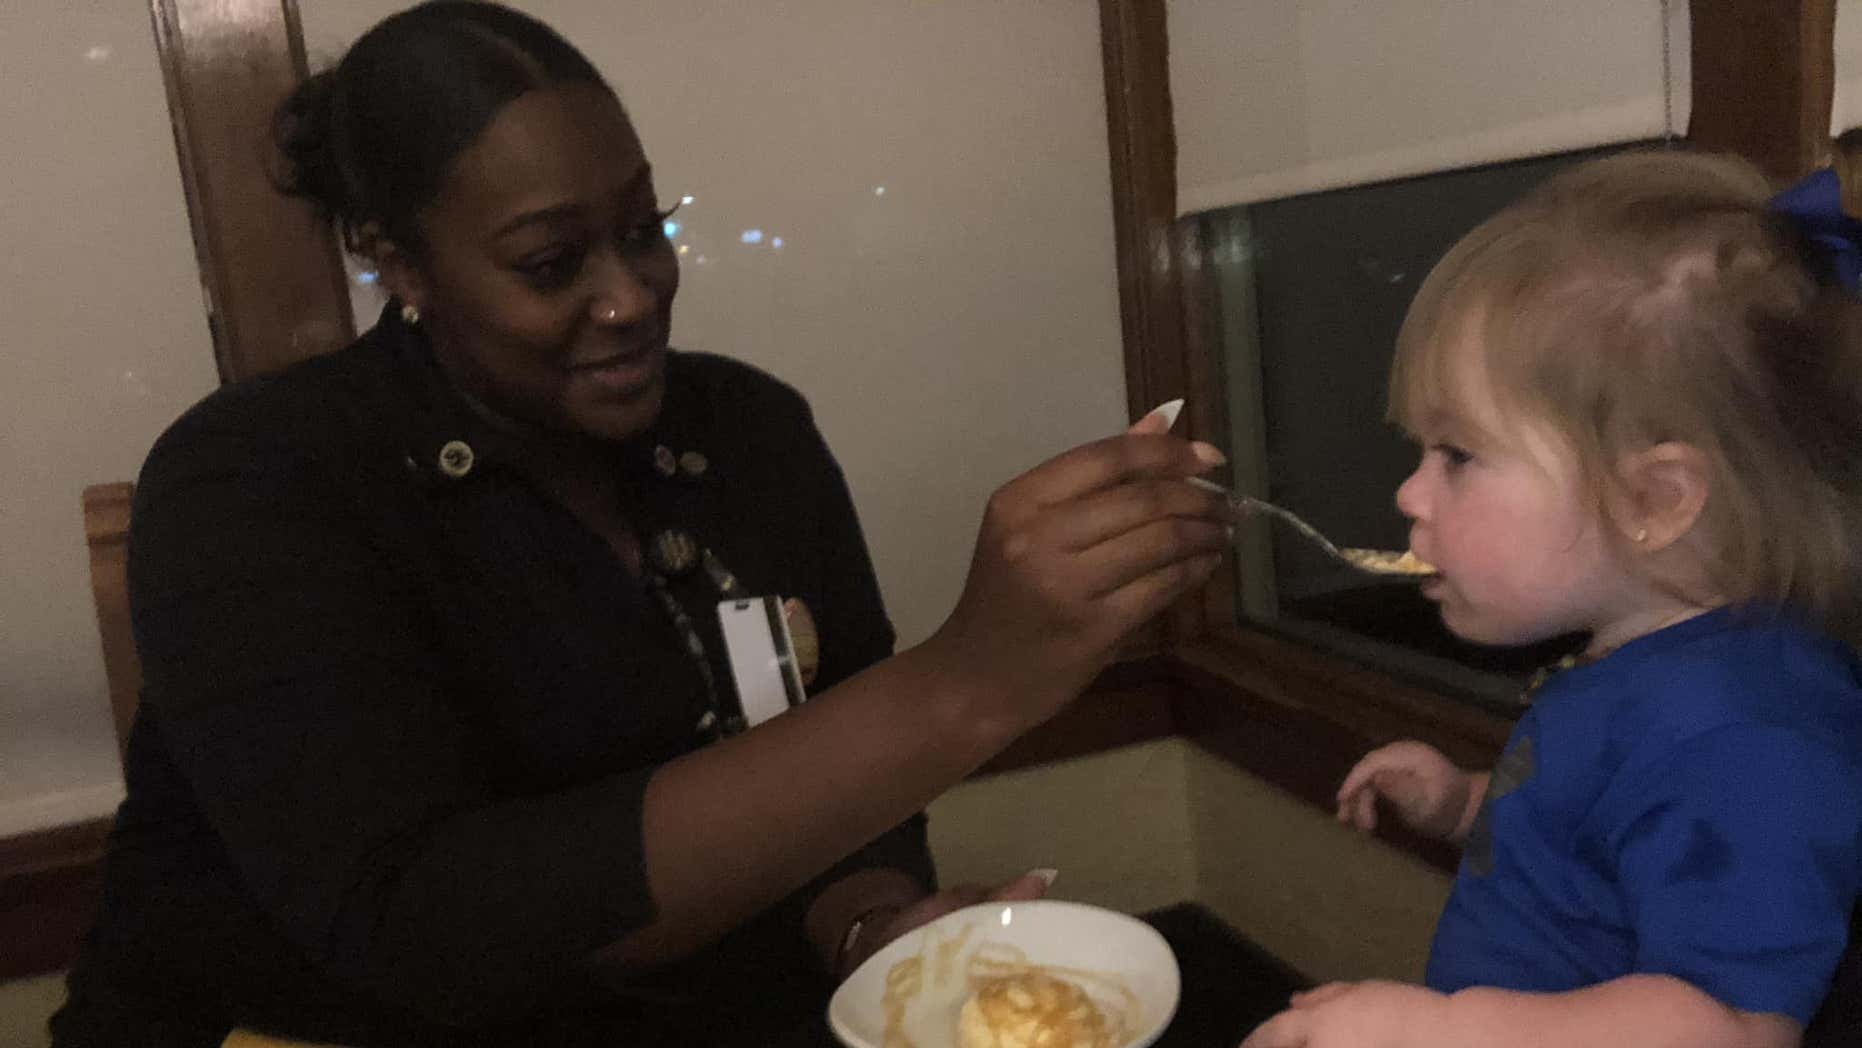 North Carolina mom Courtney Pedigo thanked the waitress for her kind act on Facebook.